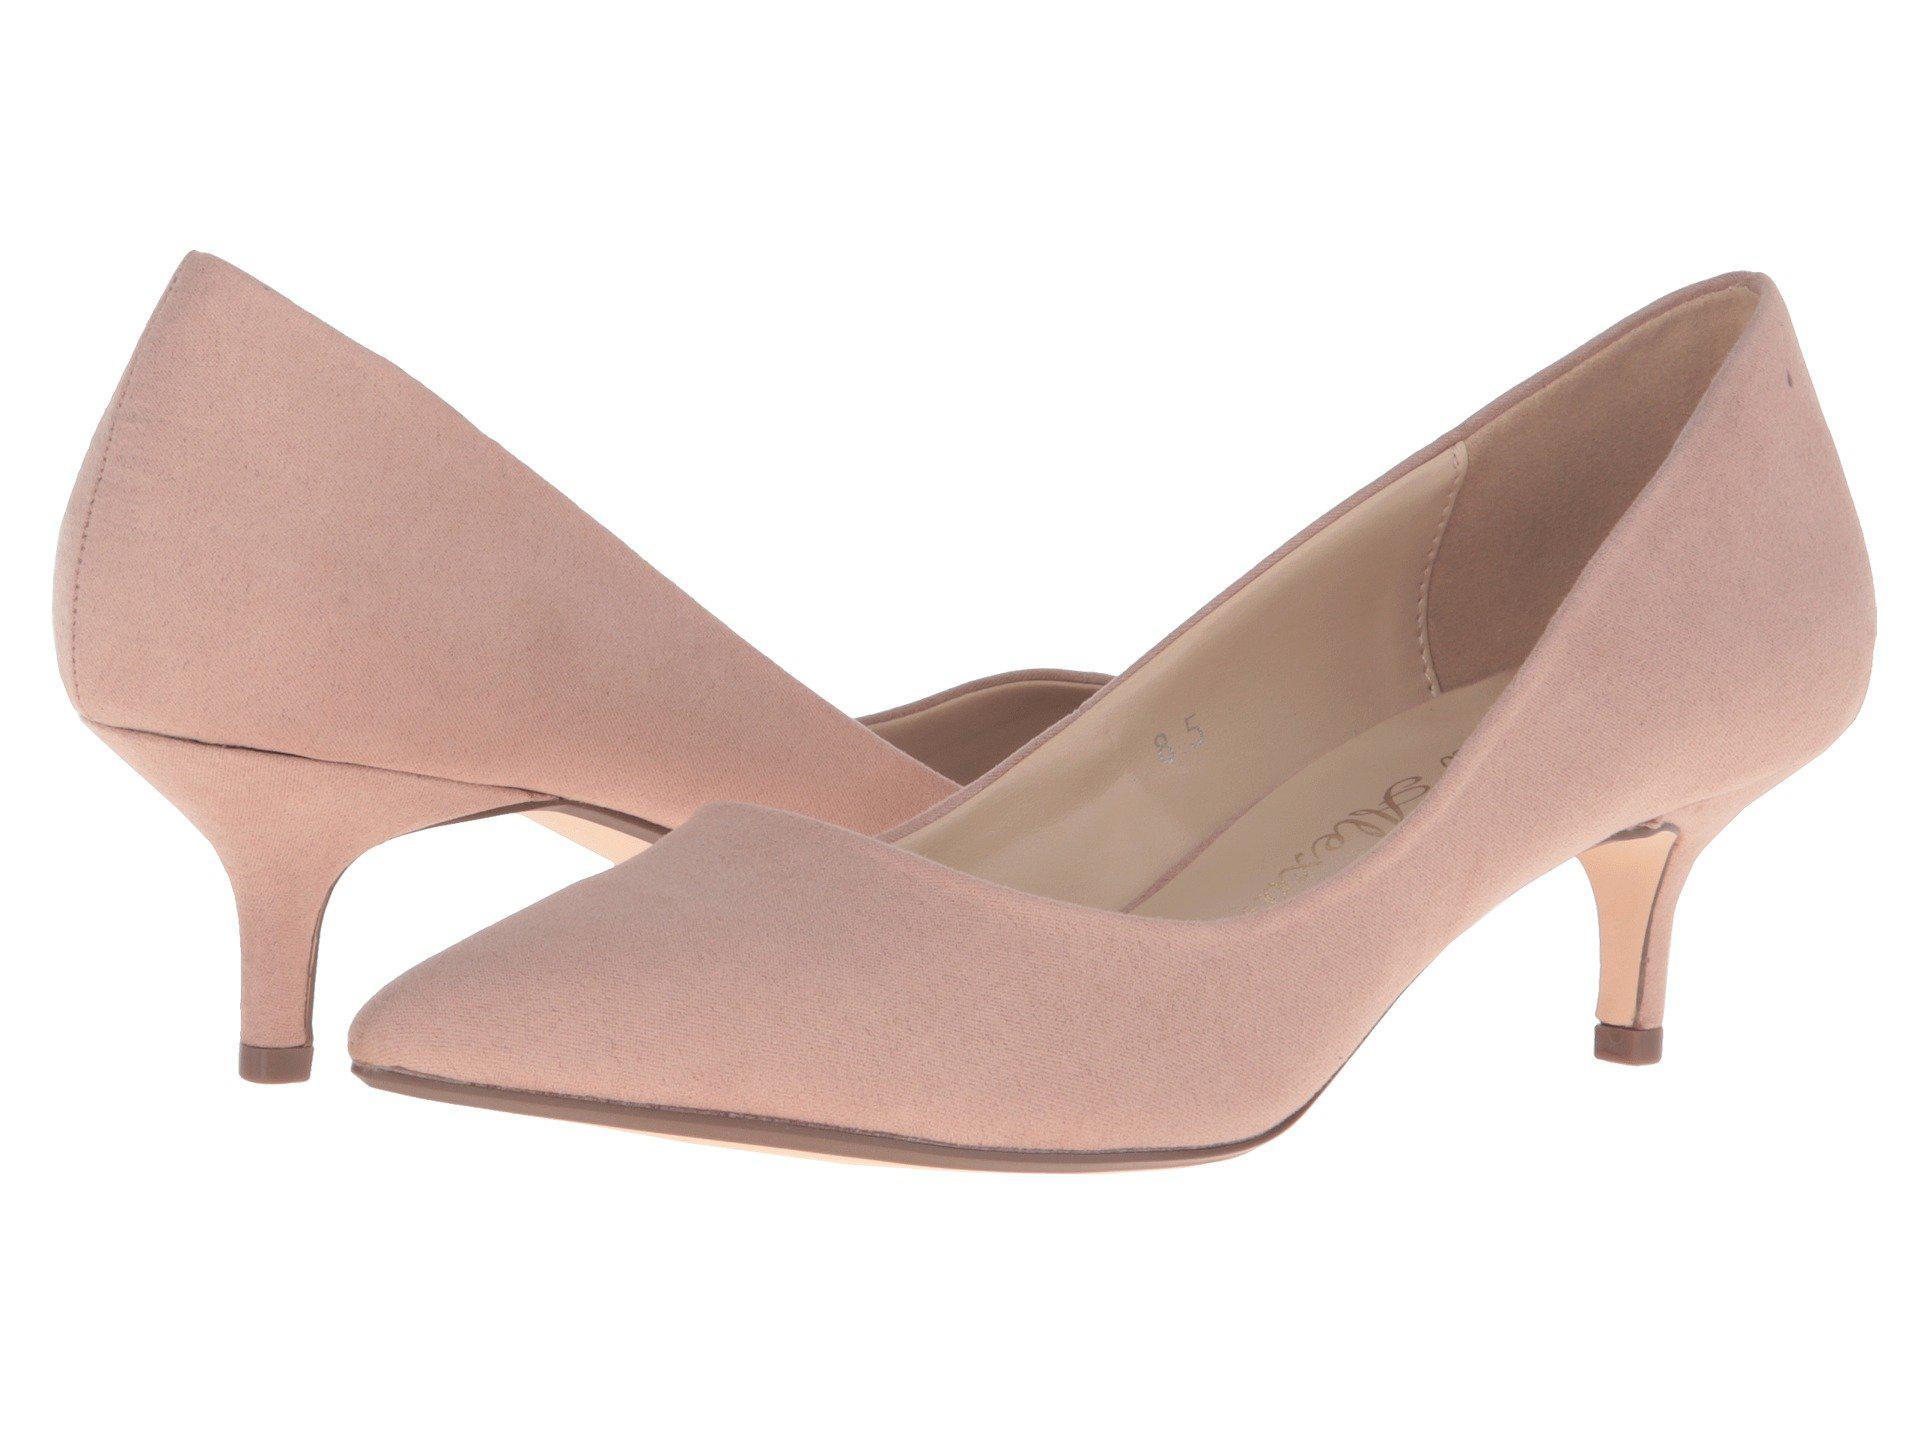 84ead40a49e Lyst - Athena Alexander Teague in Pink